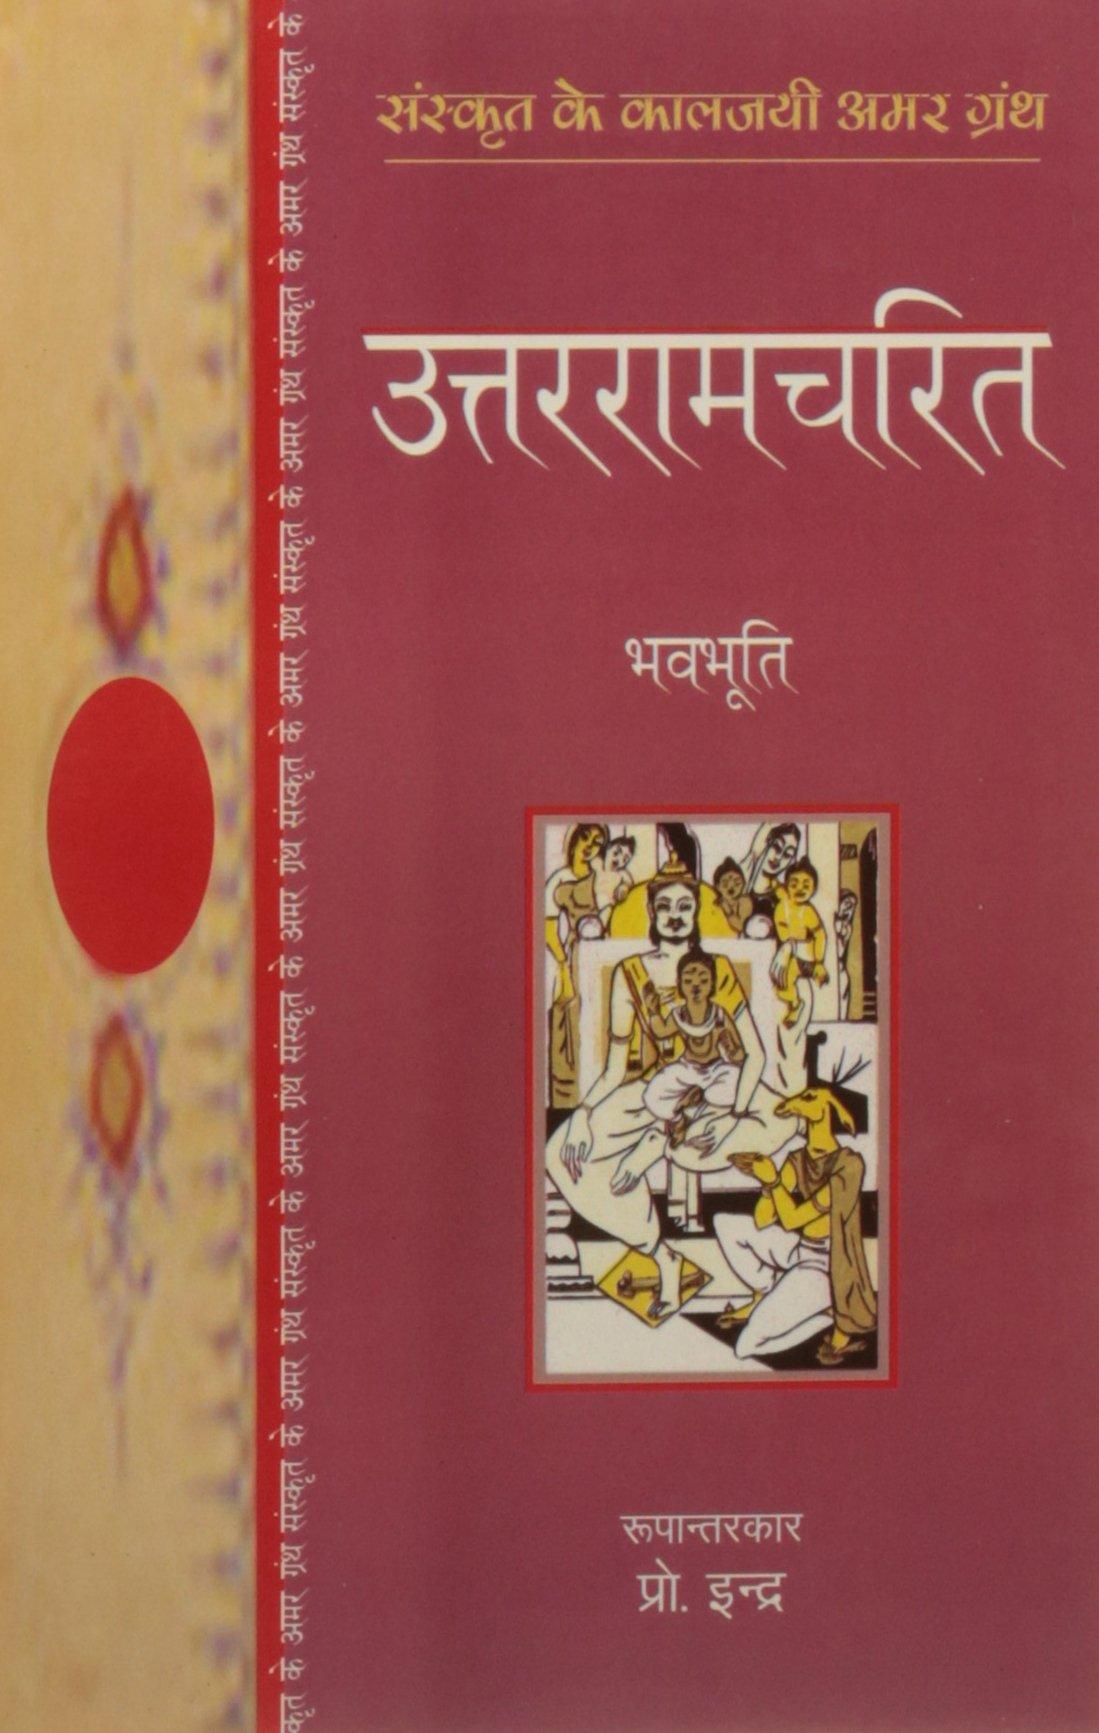 Uttaramcharit (Sanskrit Classics) (Hindi)